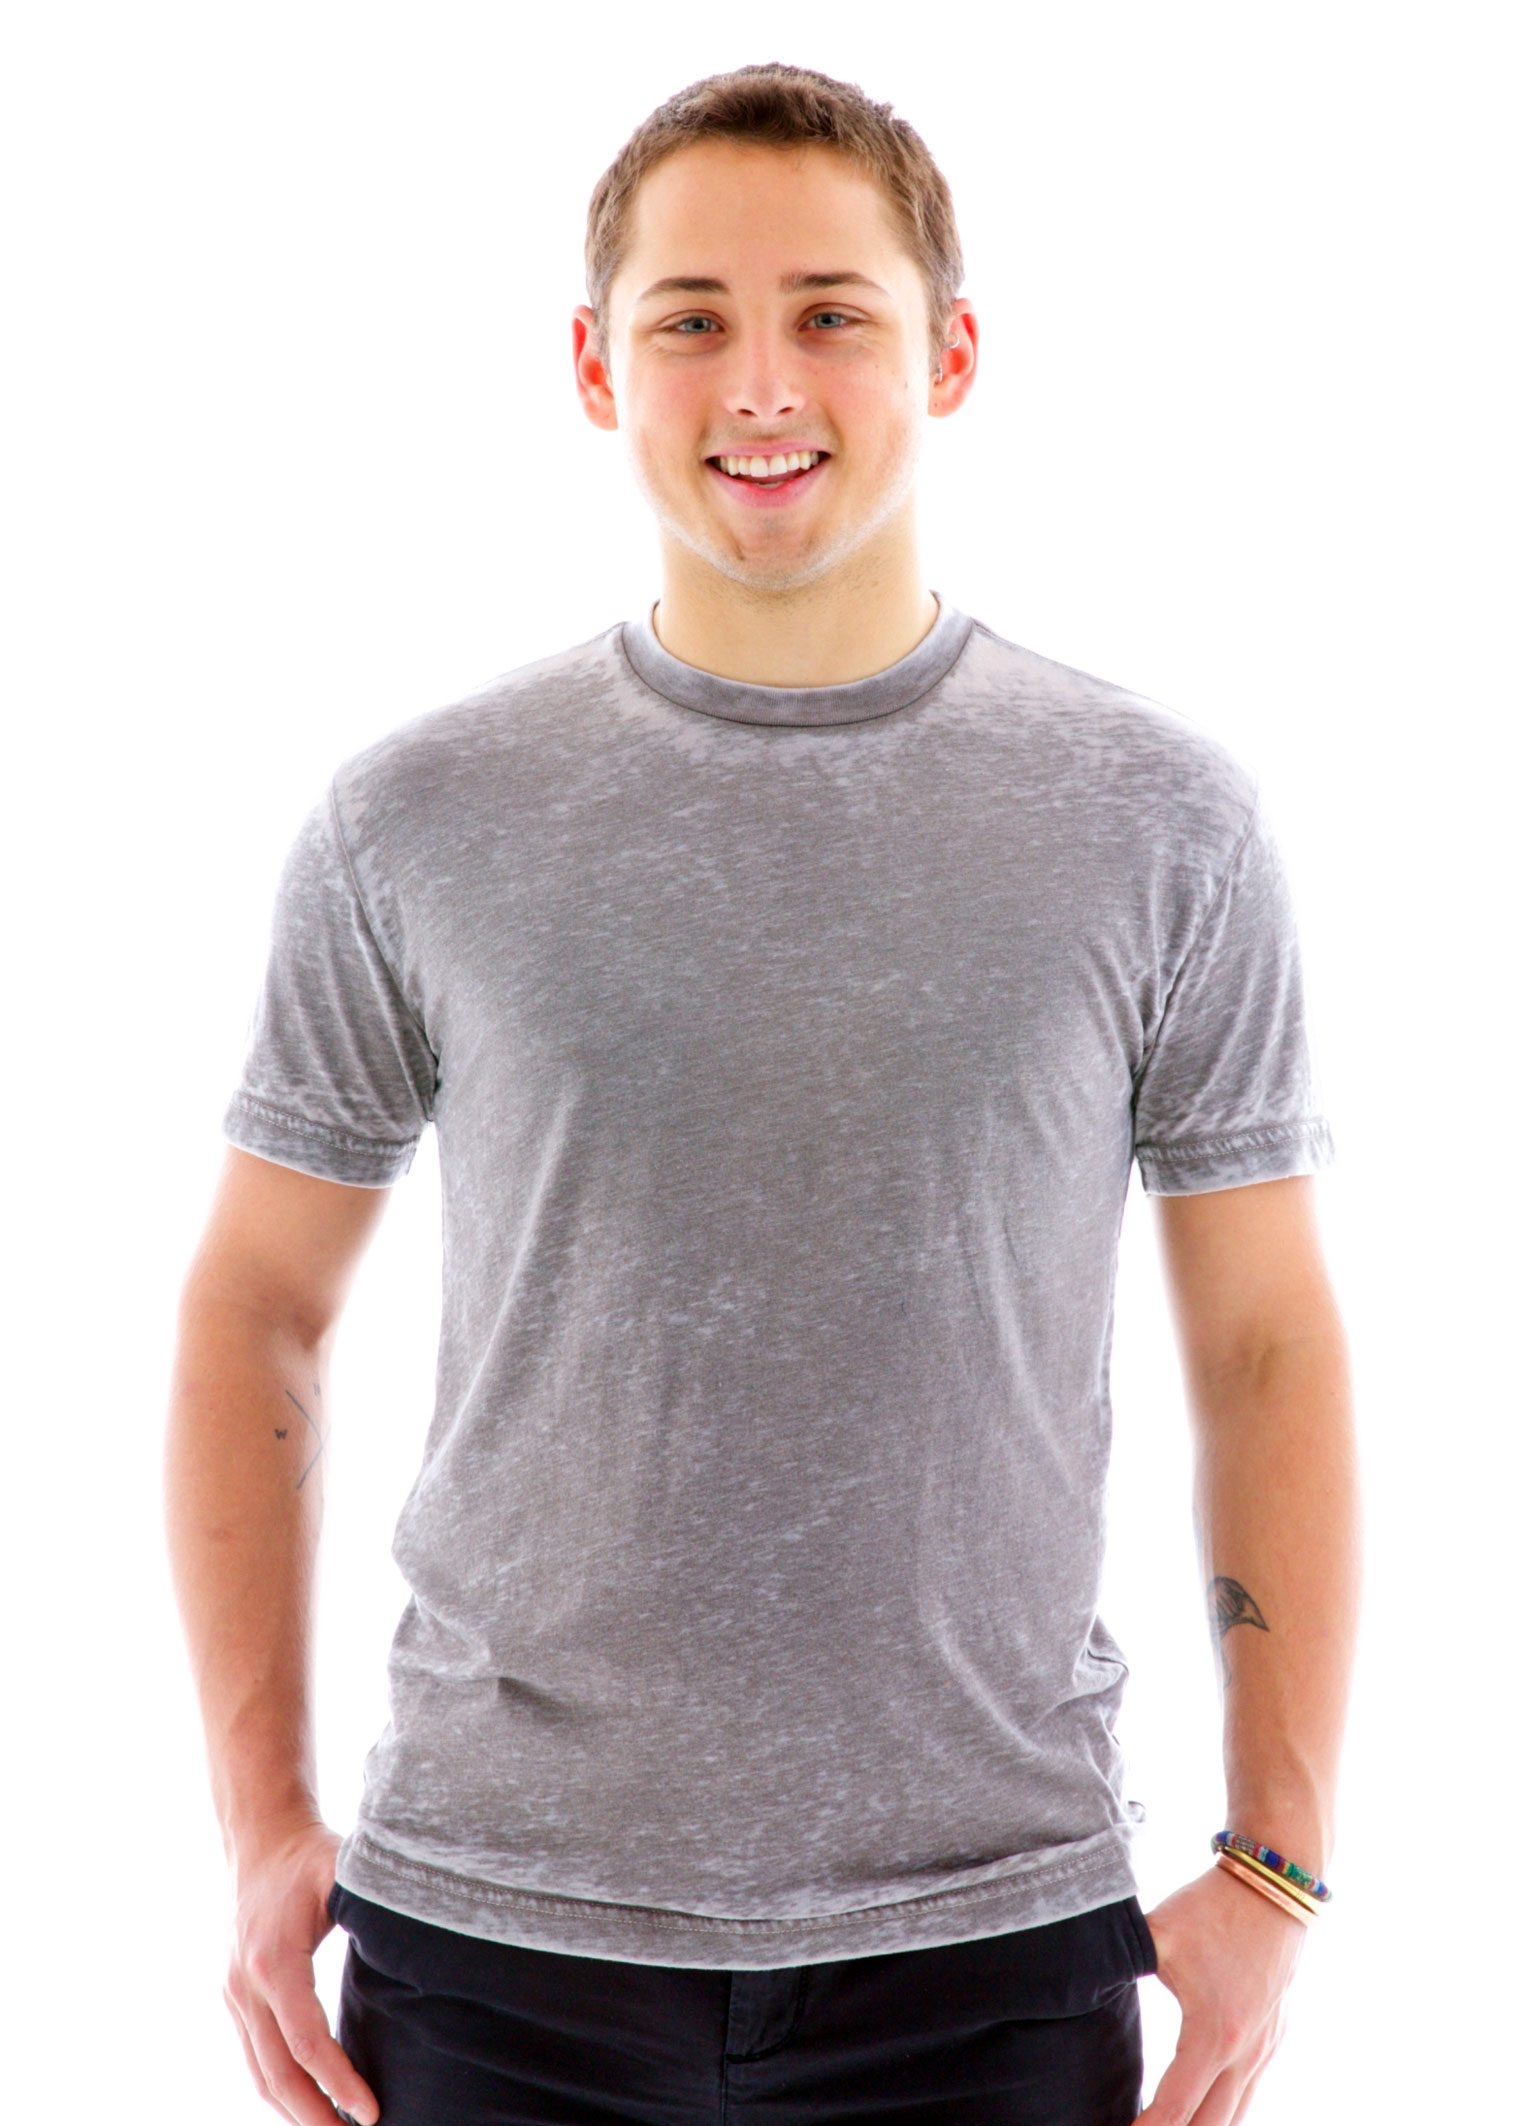 Burnout Crew Custom Printed T-Shirt for Men | Golden Goods